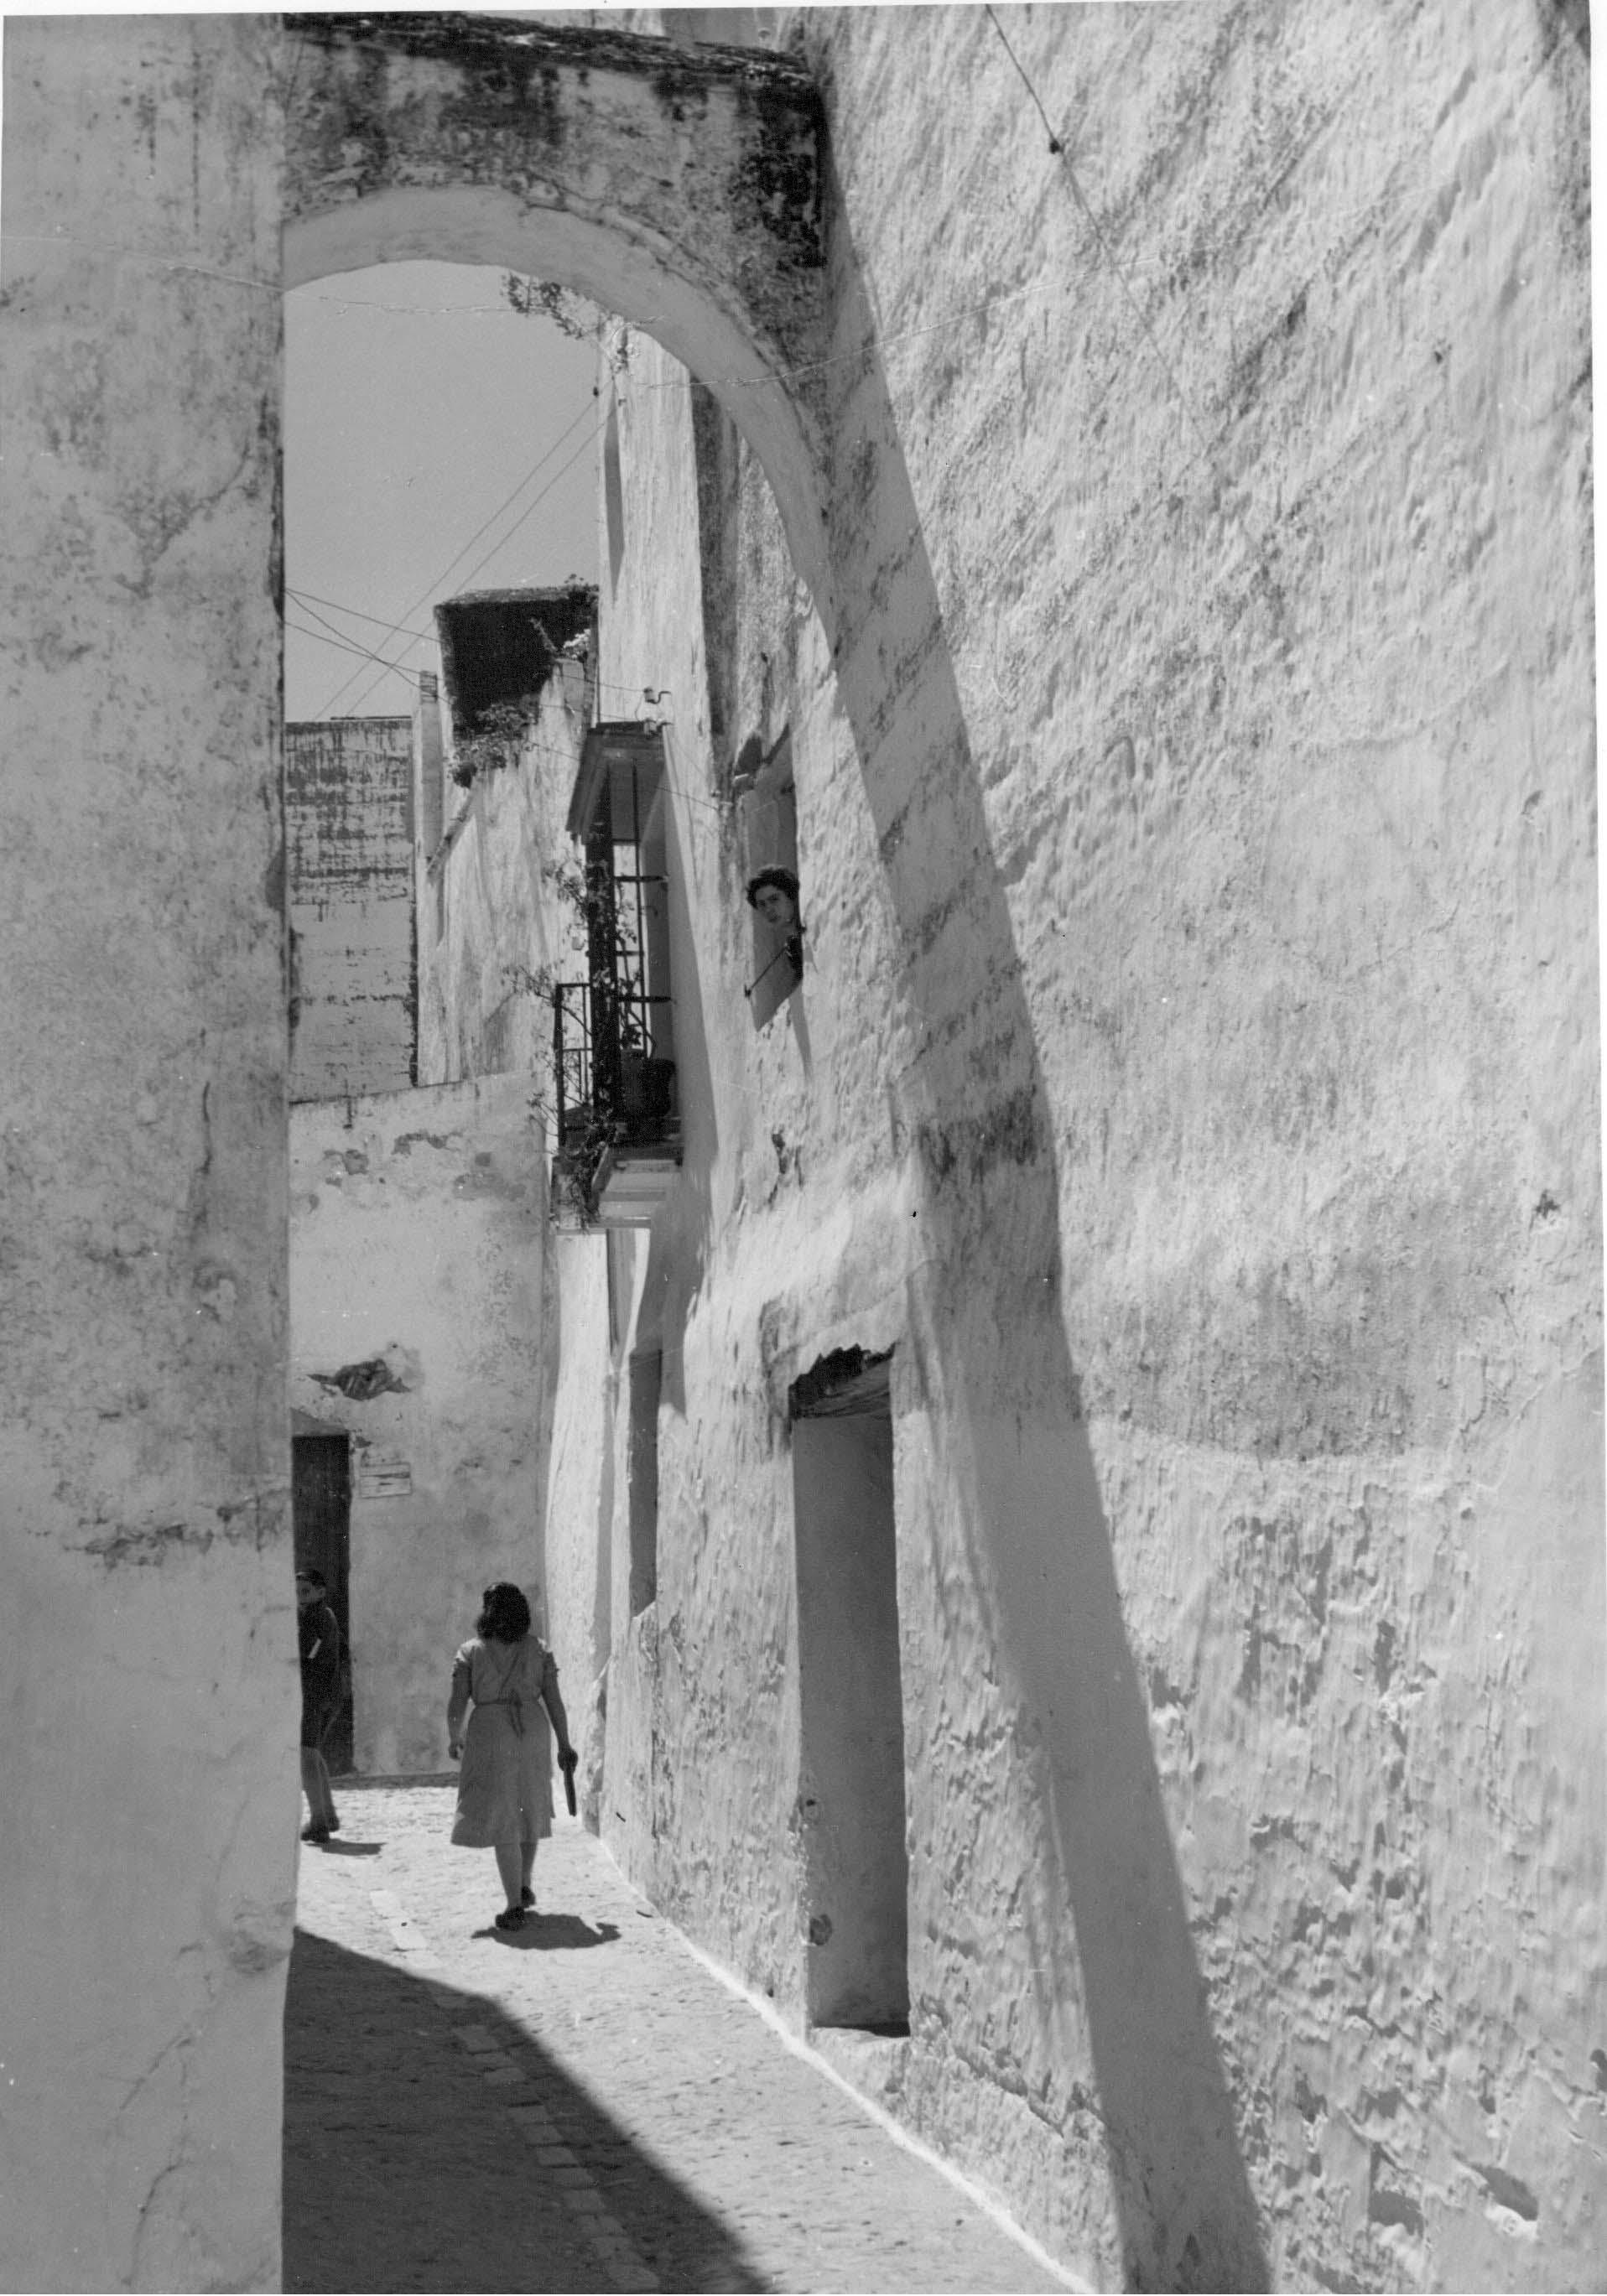 Arcos c.a. 1950<br/>Gelatina de plata / Silver gelatin print